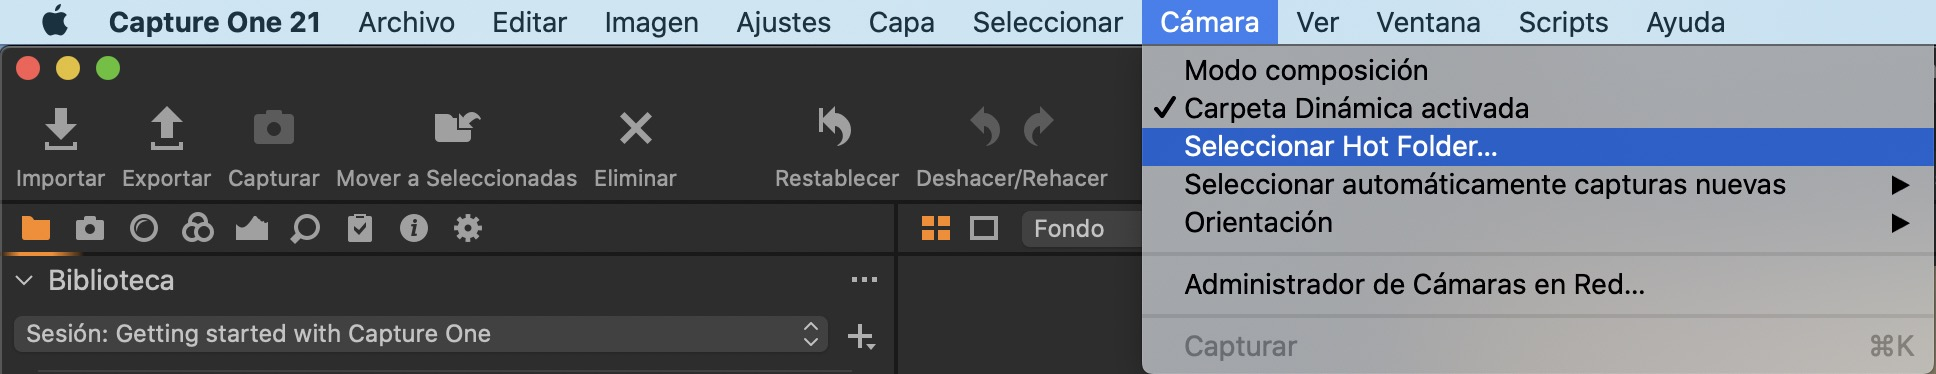 seleccionar hot folder capture one